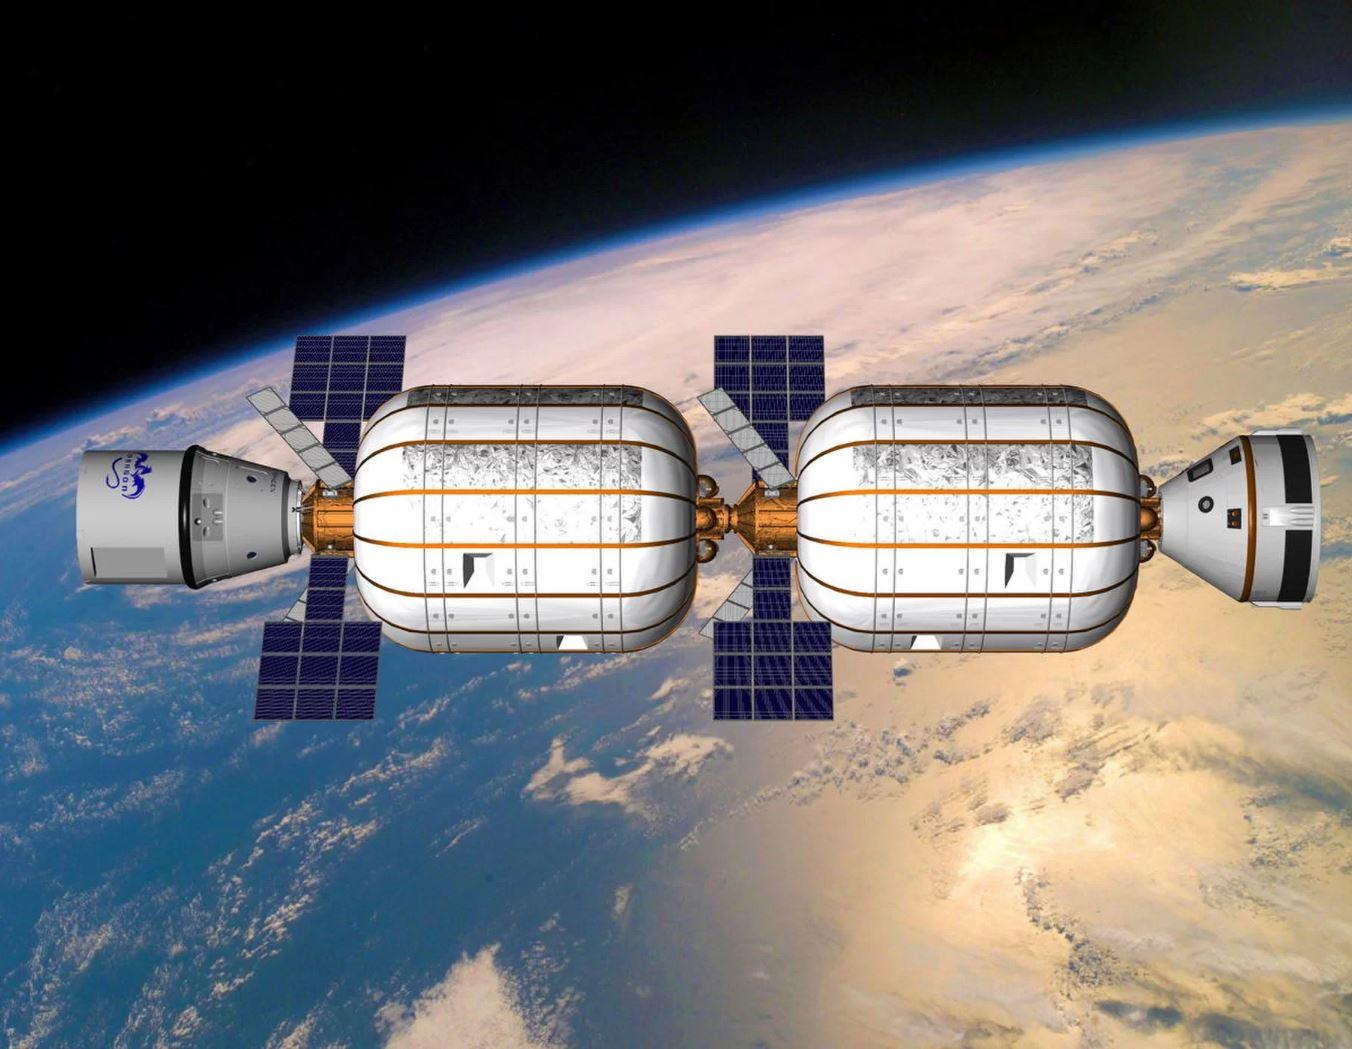 Image: Bigelow Aerospace